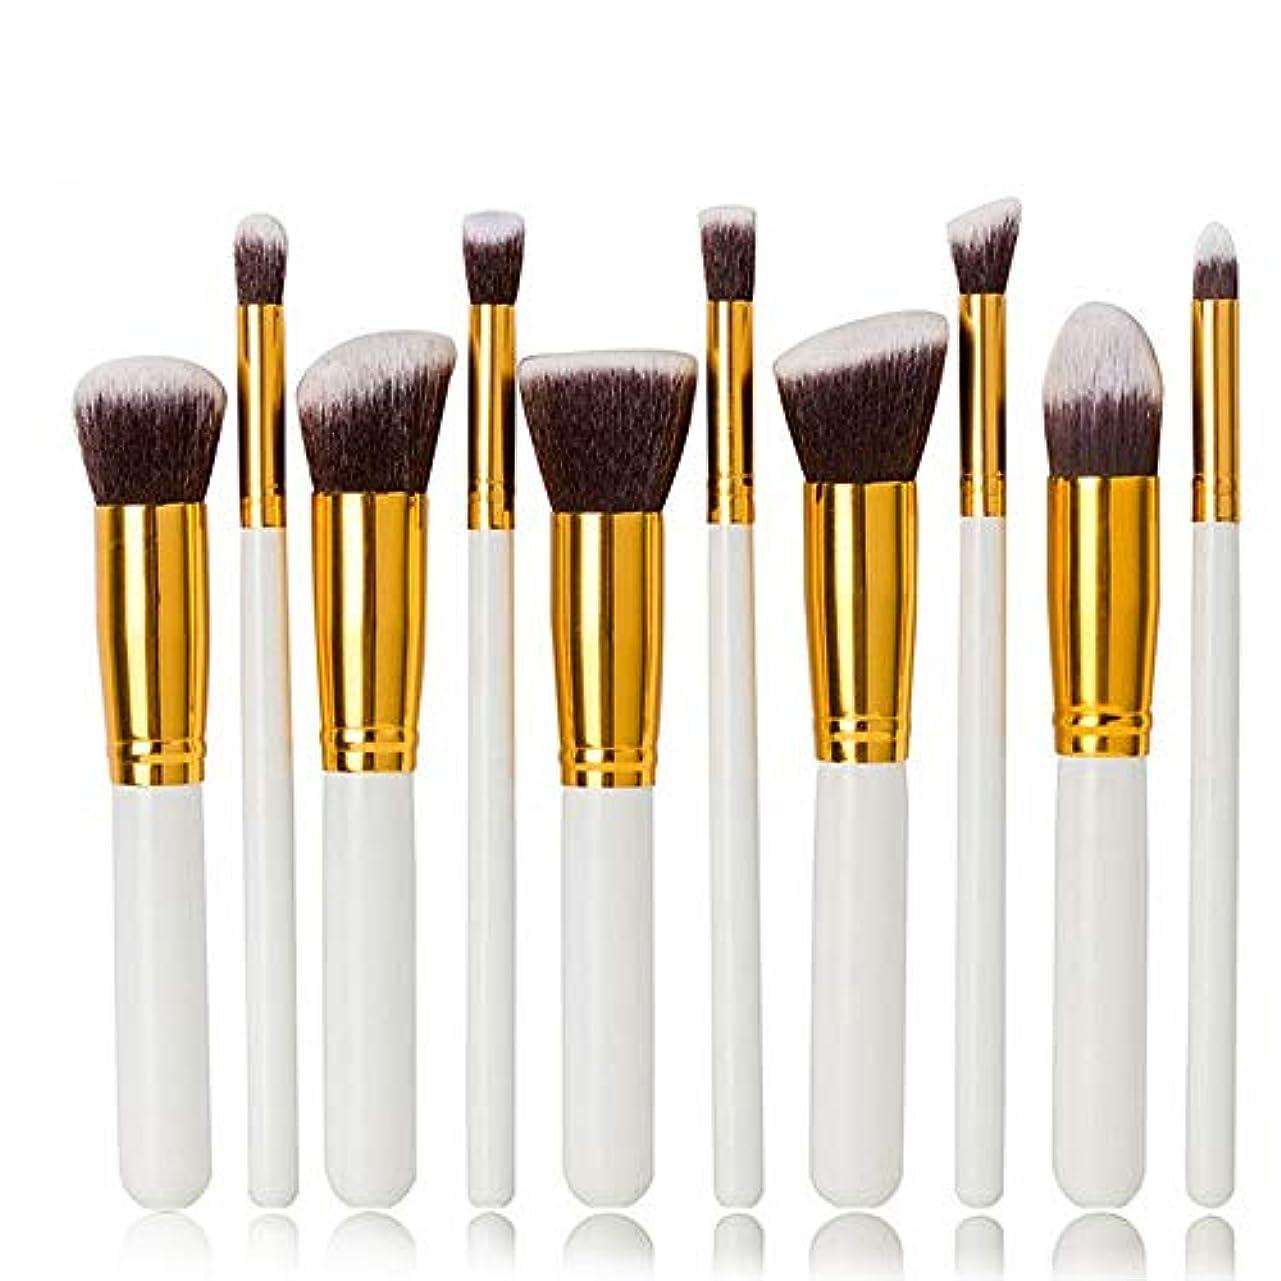 Makeup brushes 10ピースホワイトメイクブラシセット革新的なリベラルパウダーブラシアイシャドウブラシコンターブラシ suits (Color : White)